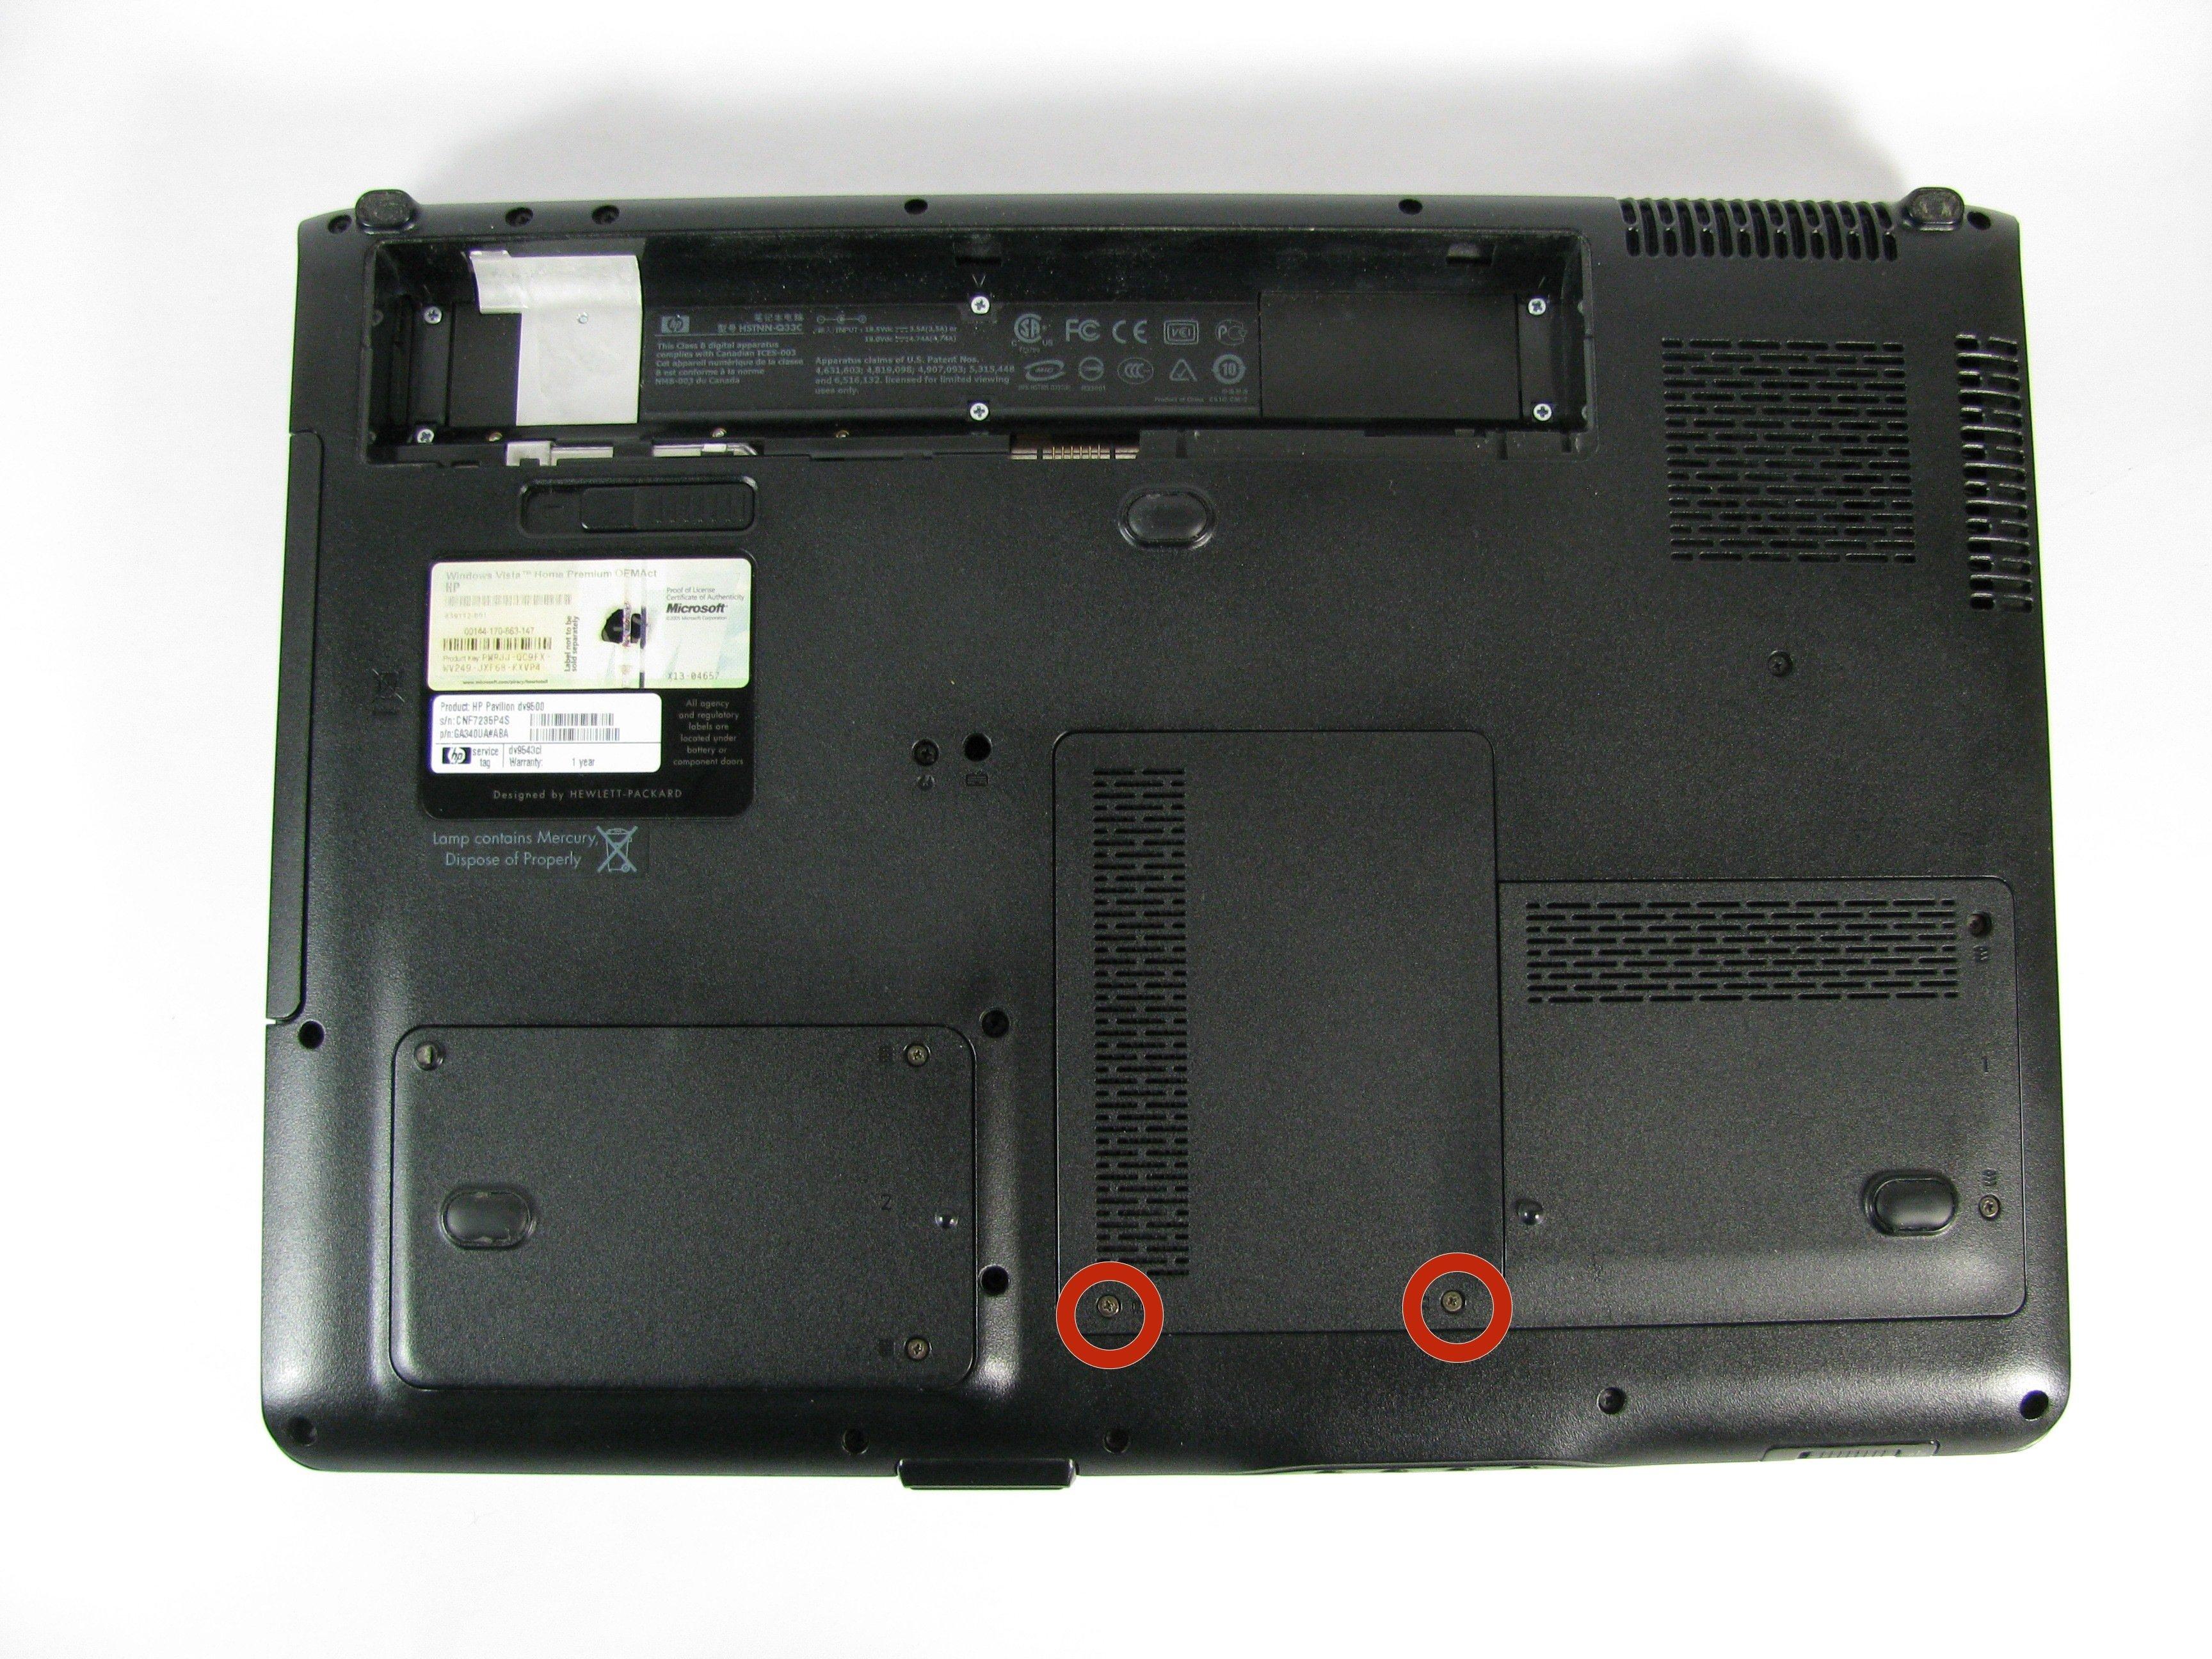 HP PAVILION DV9000 WIRELESS LAN TREIBER WINDOWS 10